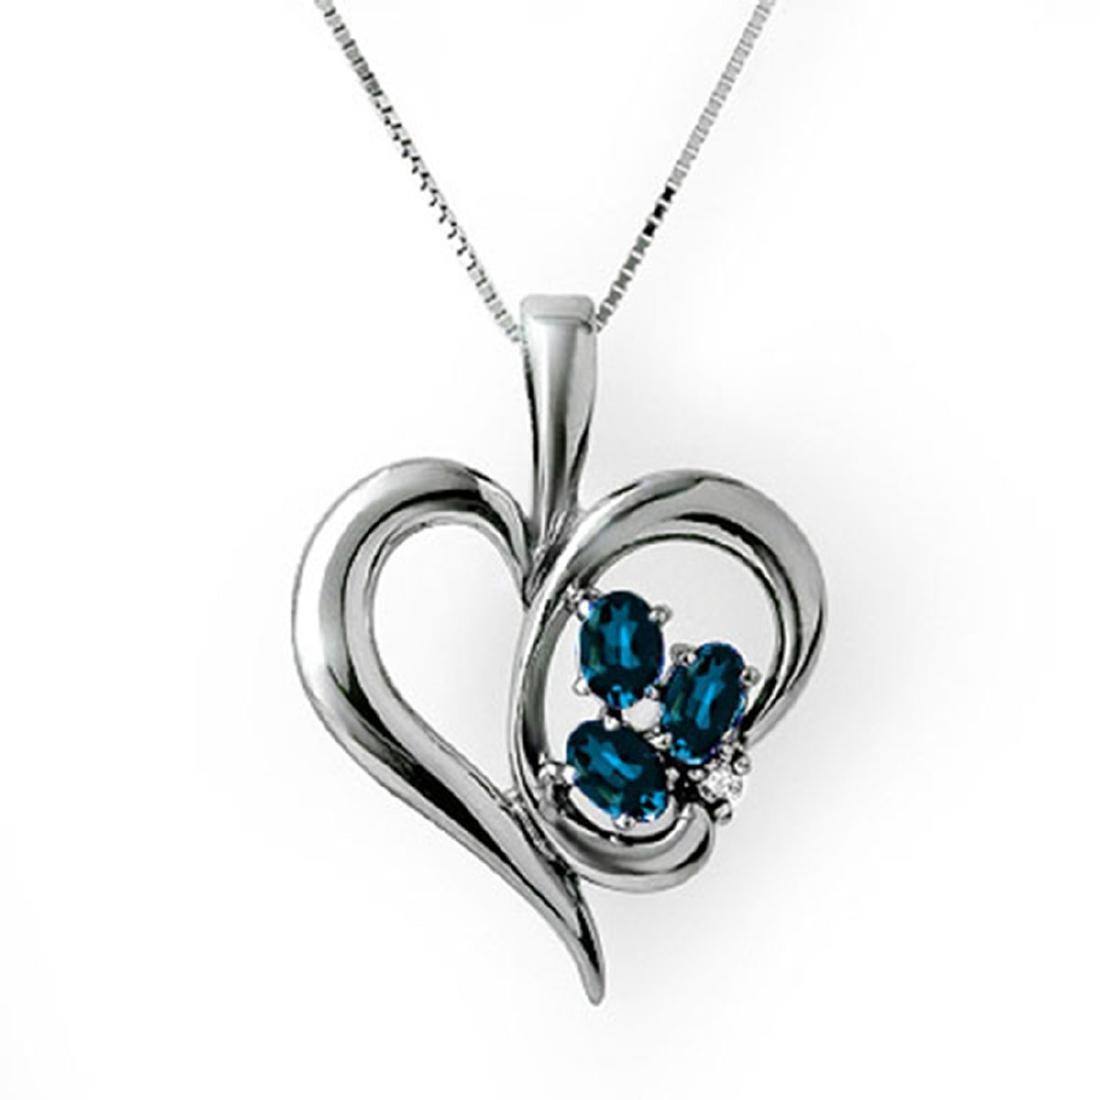 1.10 ctw Blue Sapphire & Diamond Pendant 18K White Gold